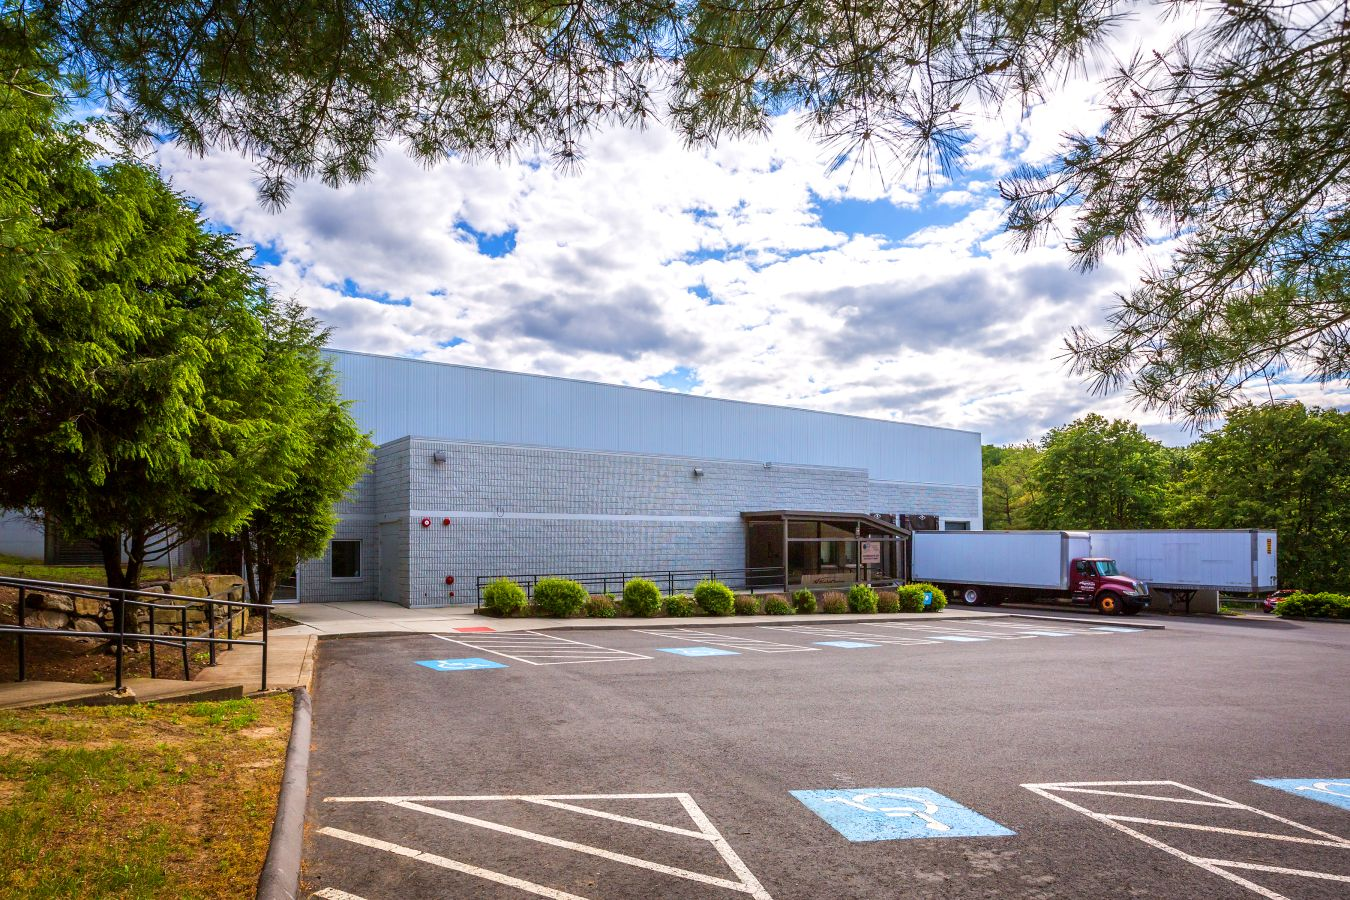 CT - 466 Bridgeport Ave